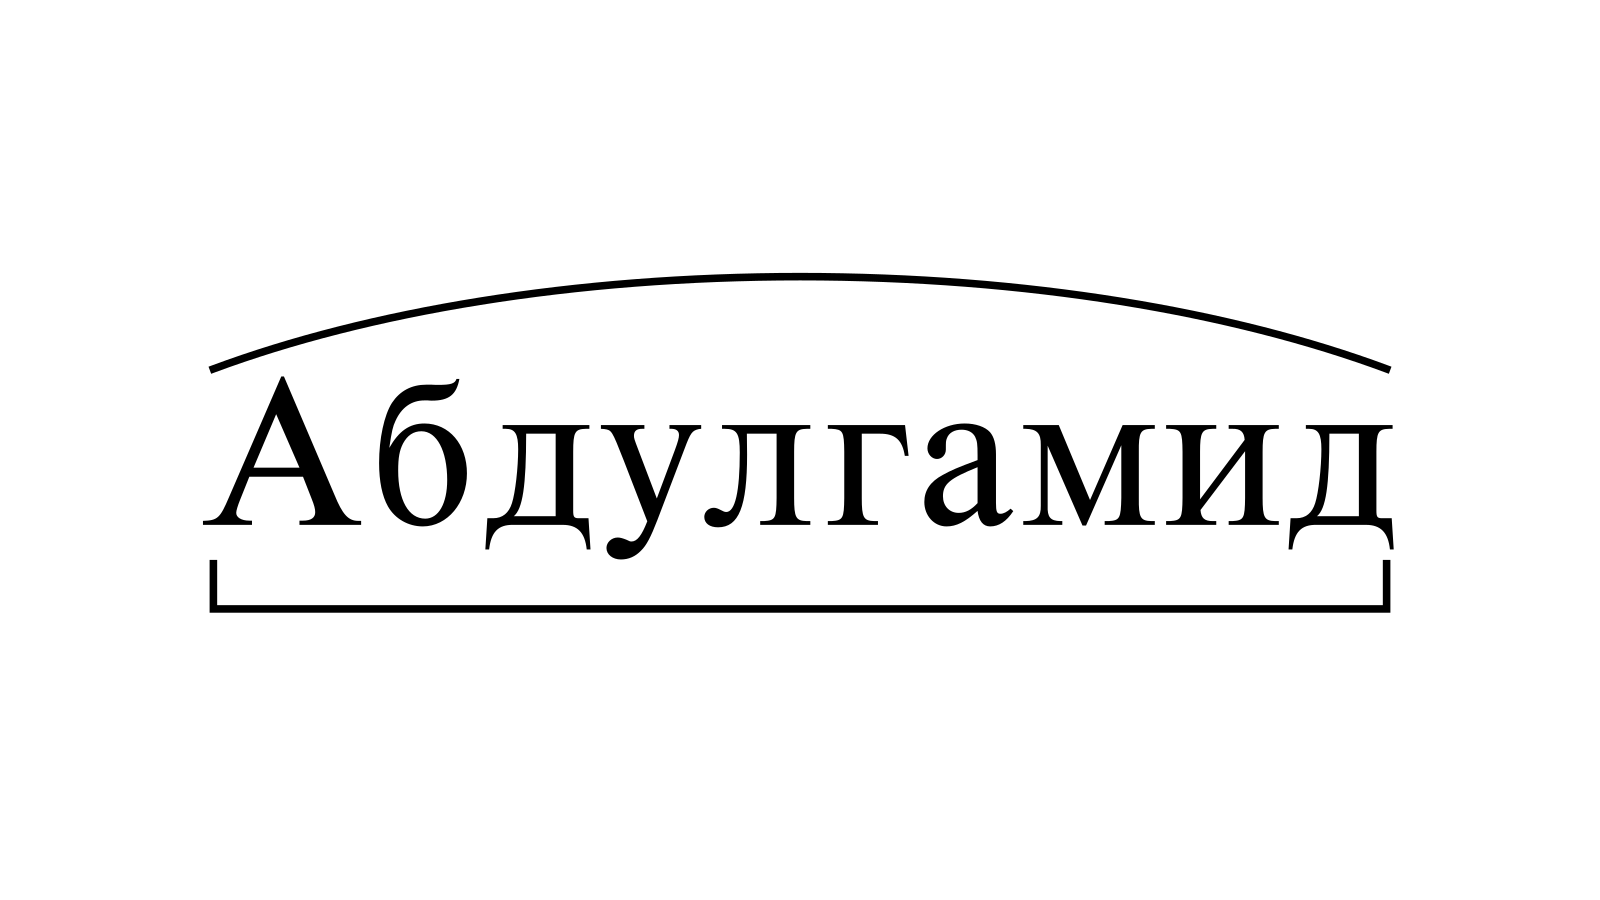 Разбор слова «Абдулгамид» по составу